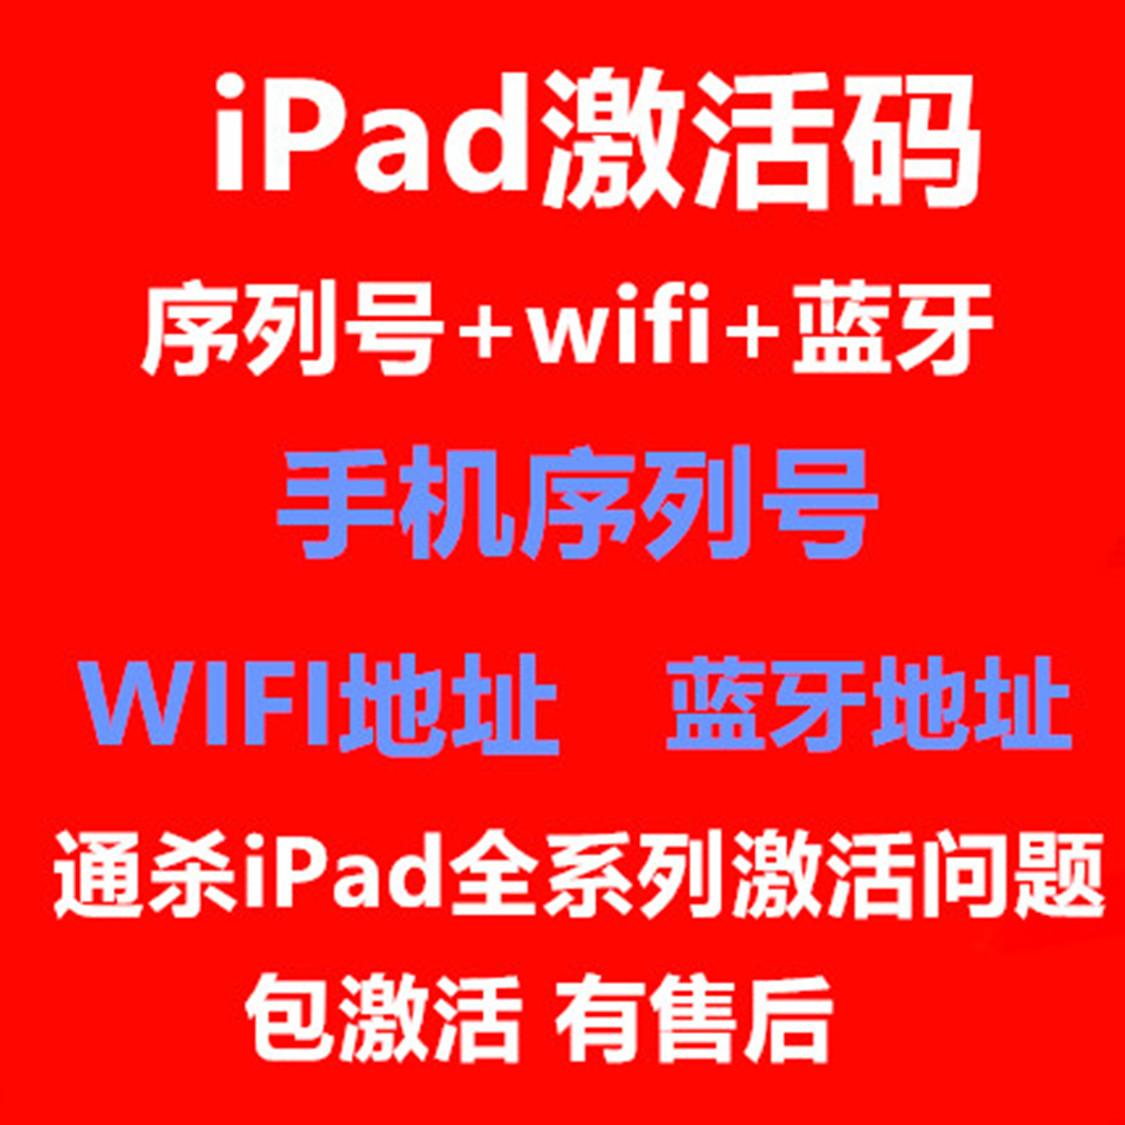 Query Apple WiFi Bluetooth Foxconn iphone Shanghai Pegatron address IPAD  factory Activation Code